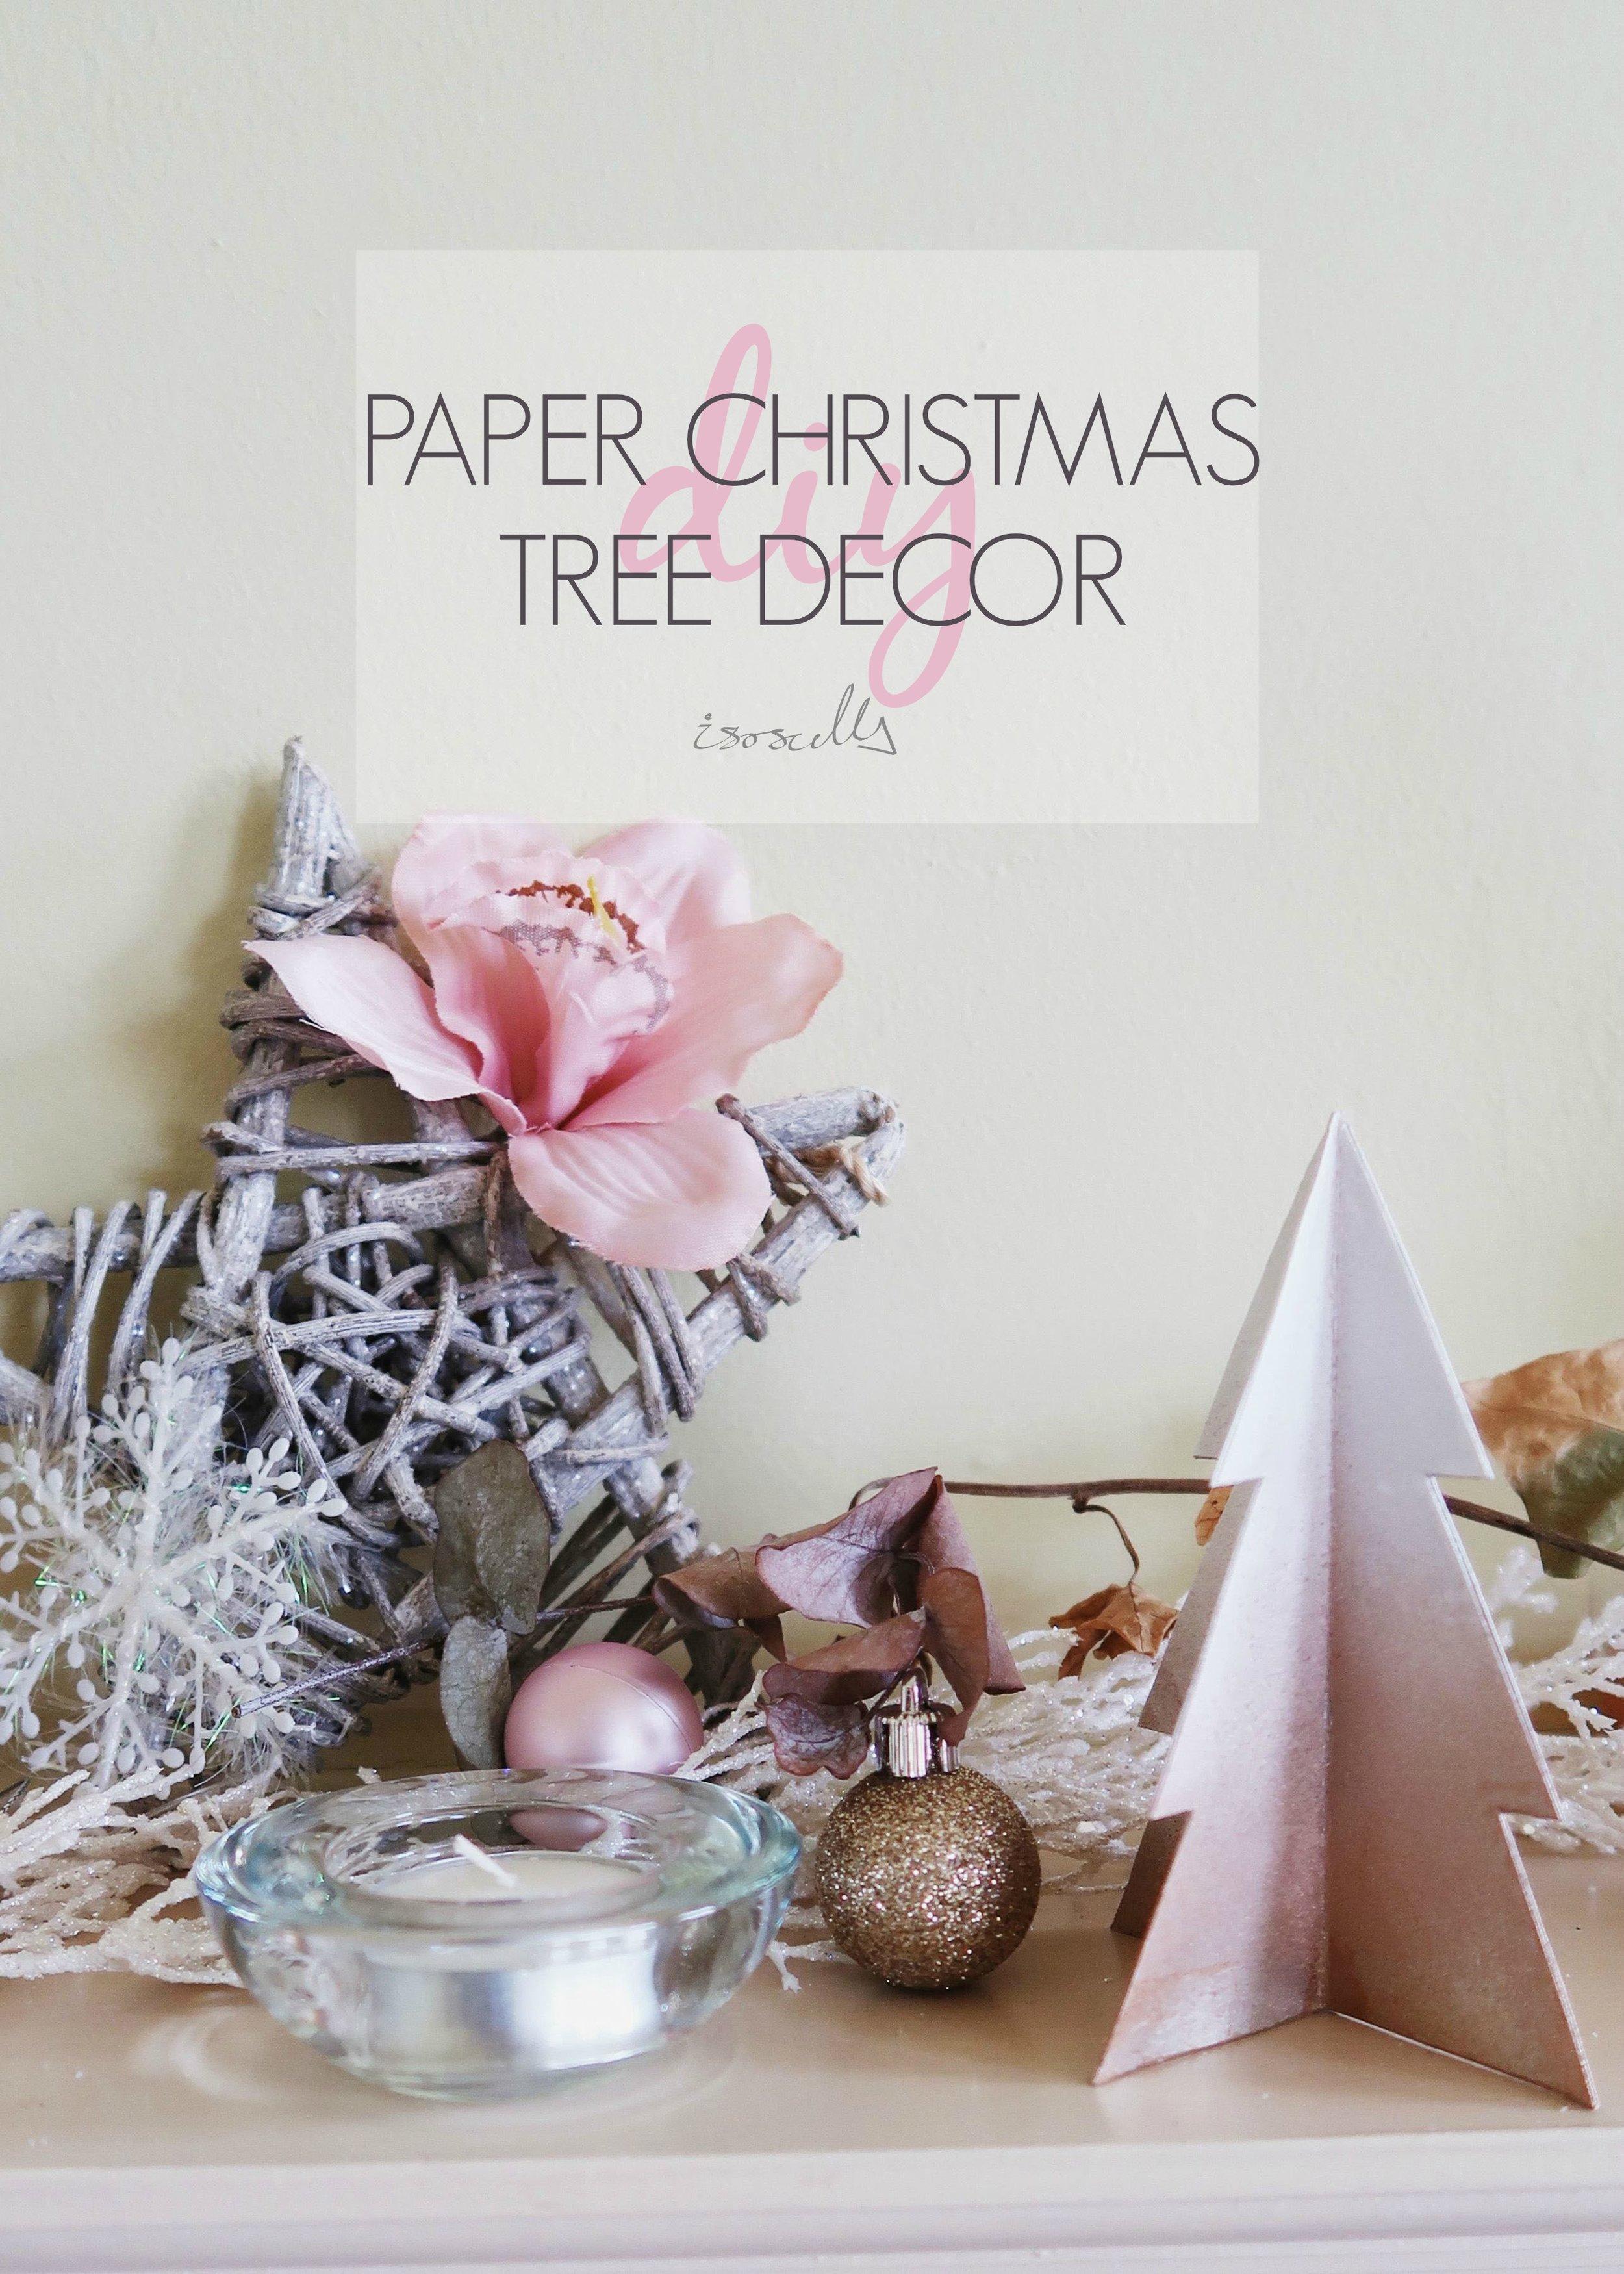 DIY Paper Christmas Tree Decor by Isoscella